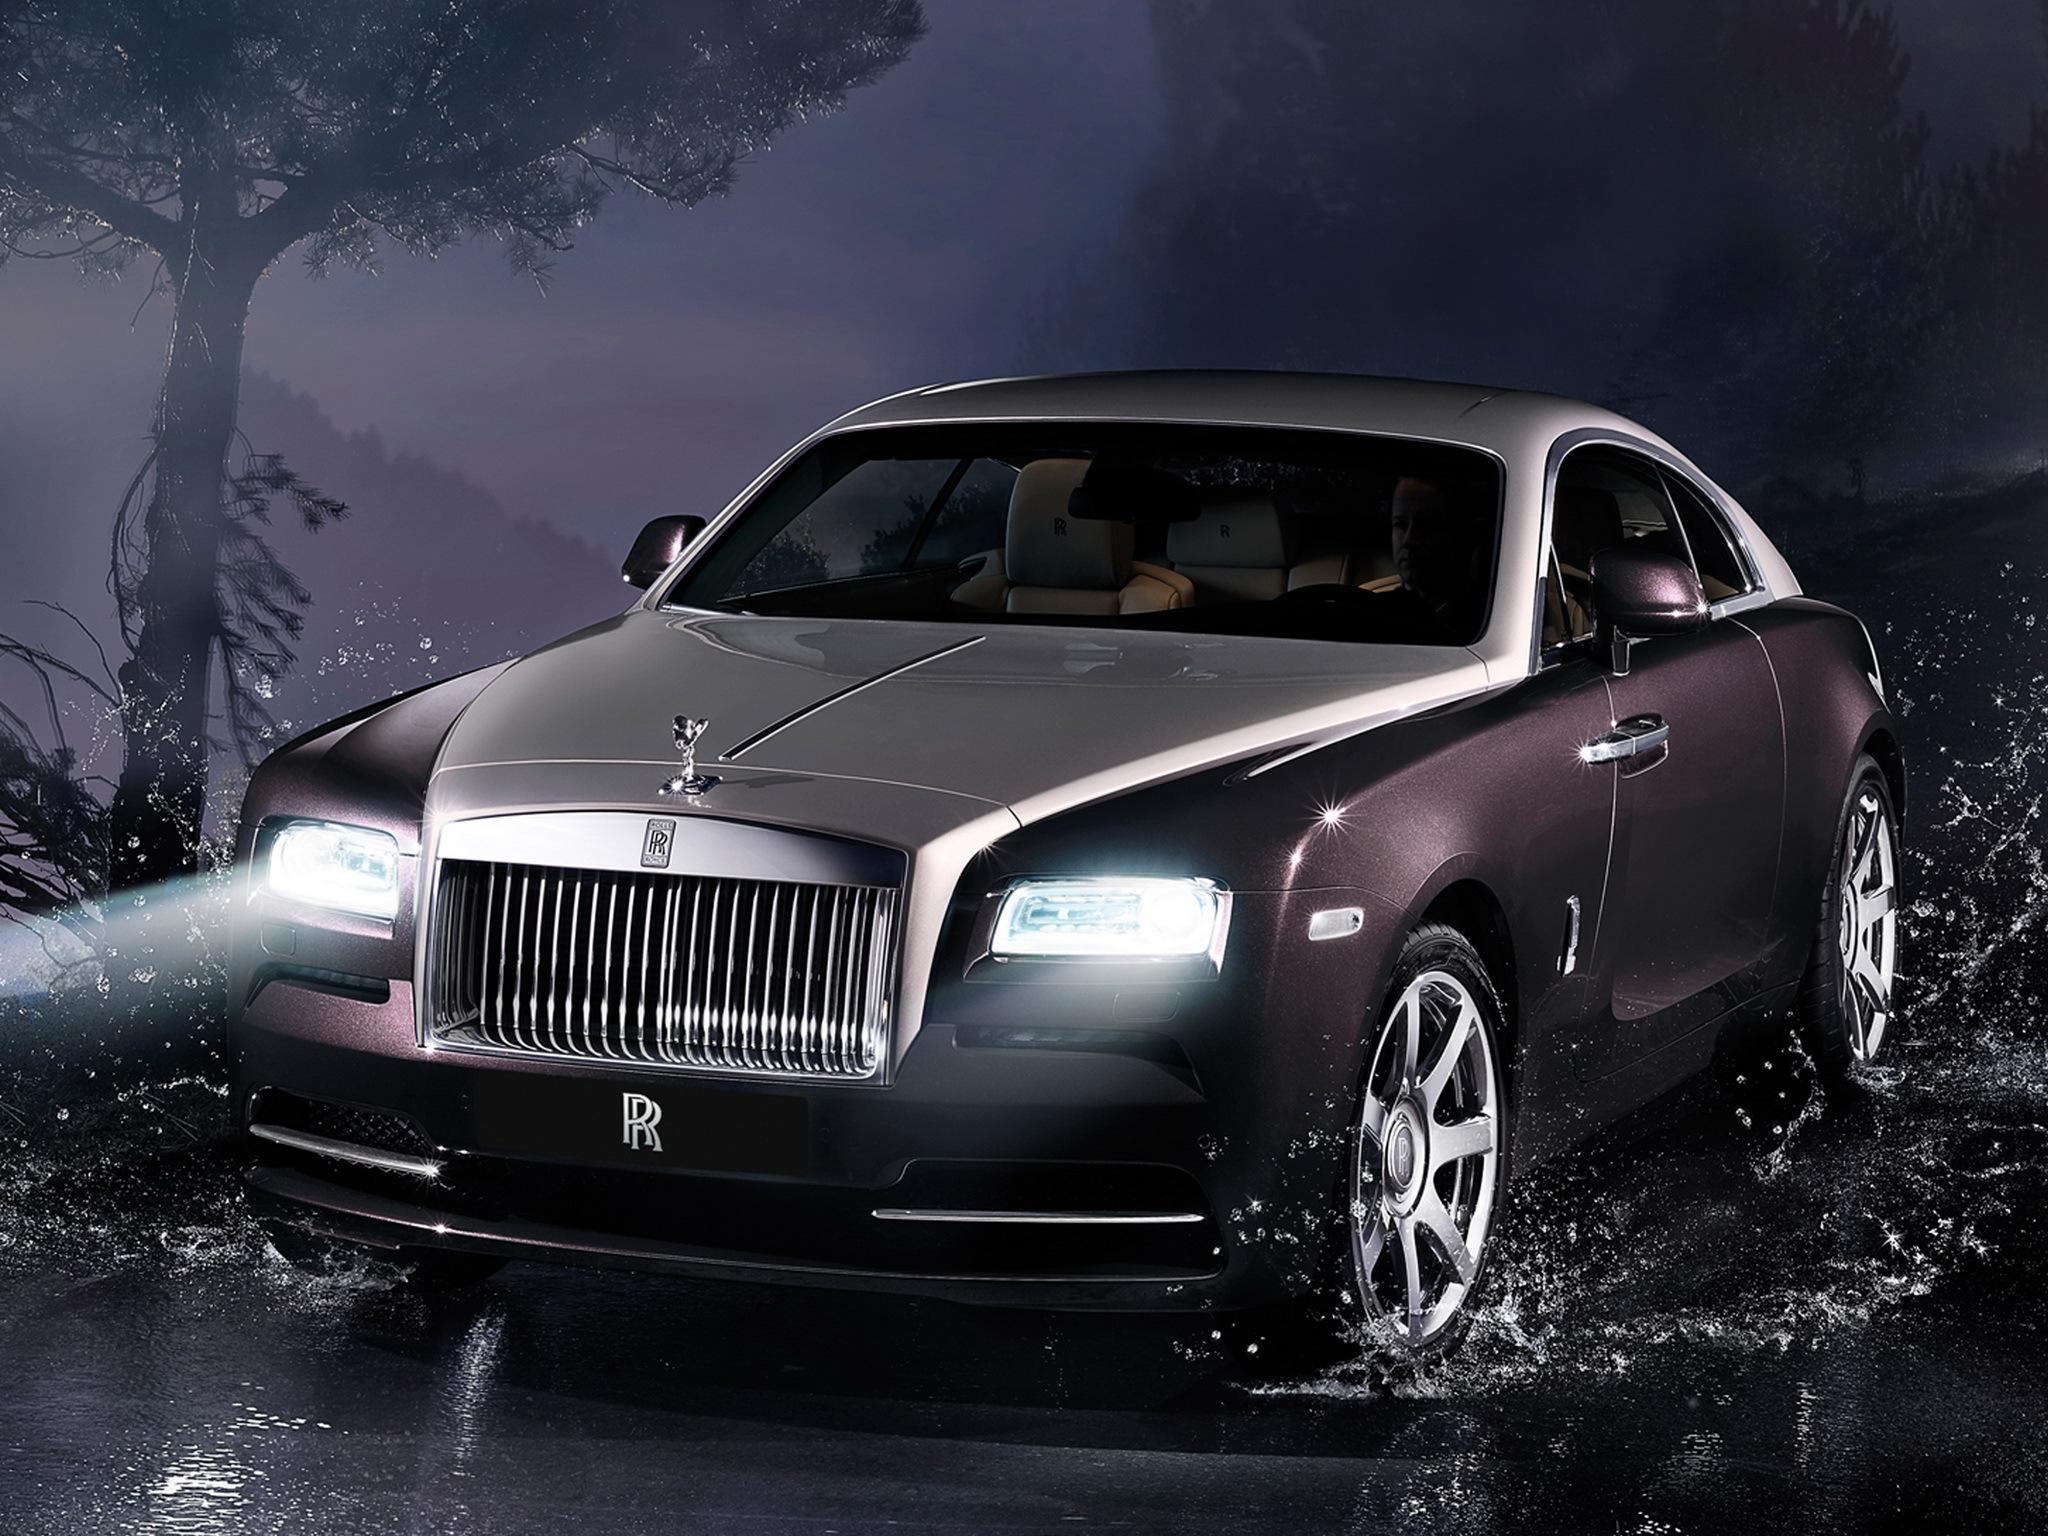 Rolls Royce Wraith 2013 Full HD 2K Wallpaper